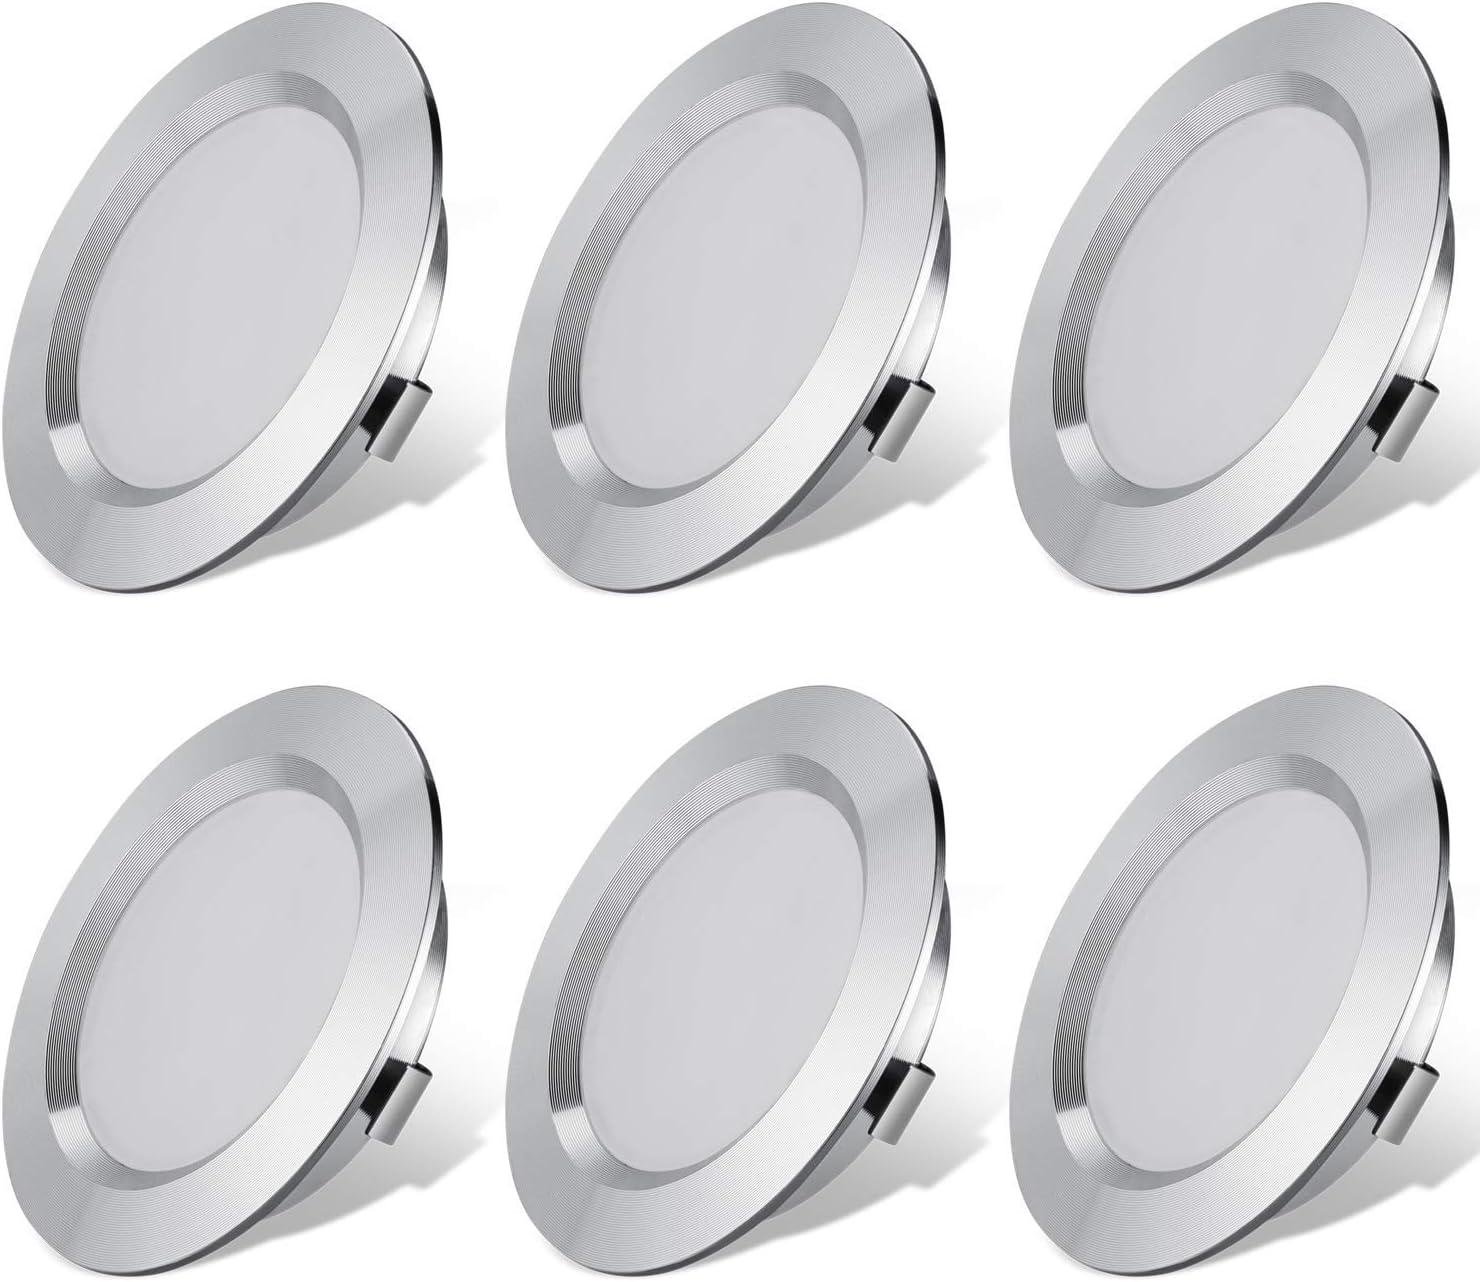 Bargain sale 12V LED Lights for RV Camper Van Warm Trailer Cheap sale 2 - White 3W 3000K